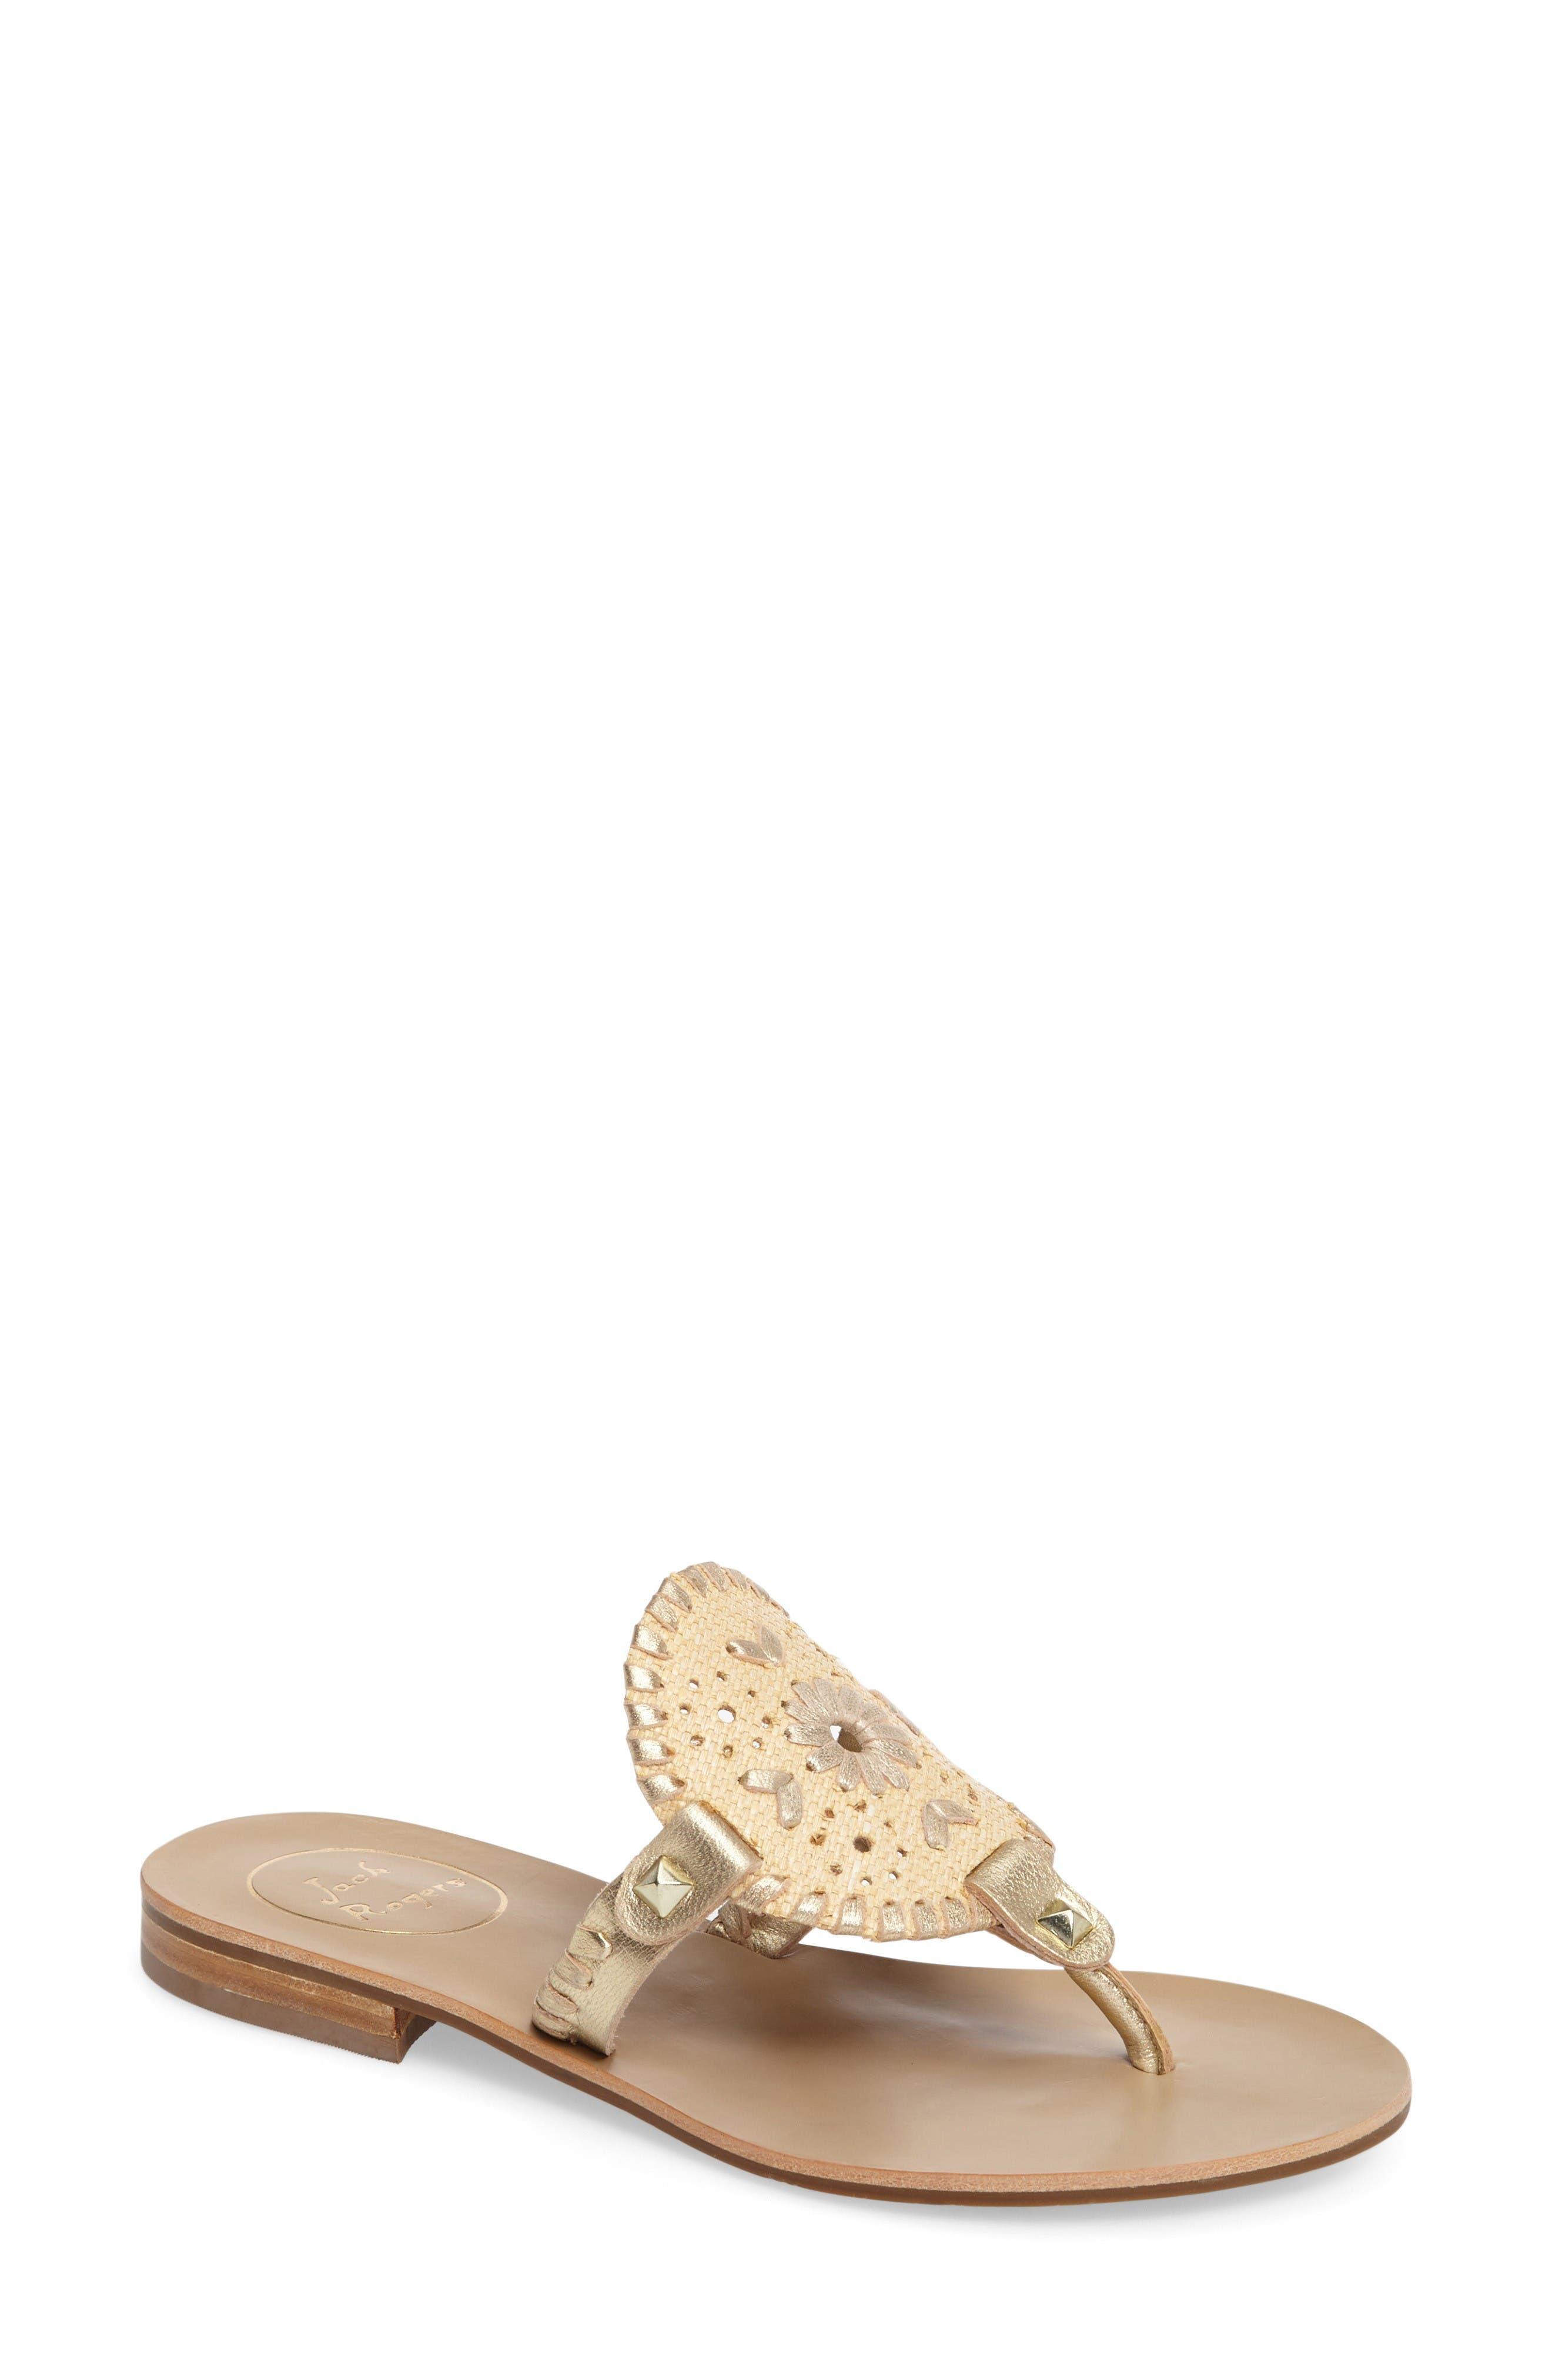 Main Image - Jack Rogers 'Georgica' Sandals (Women)